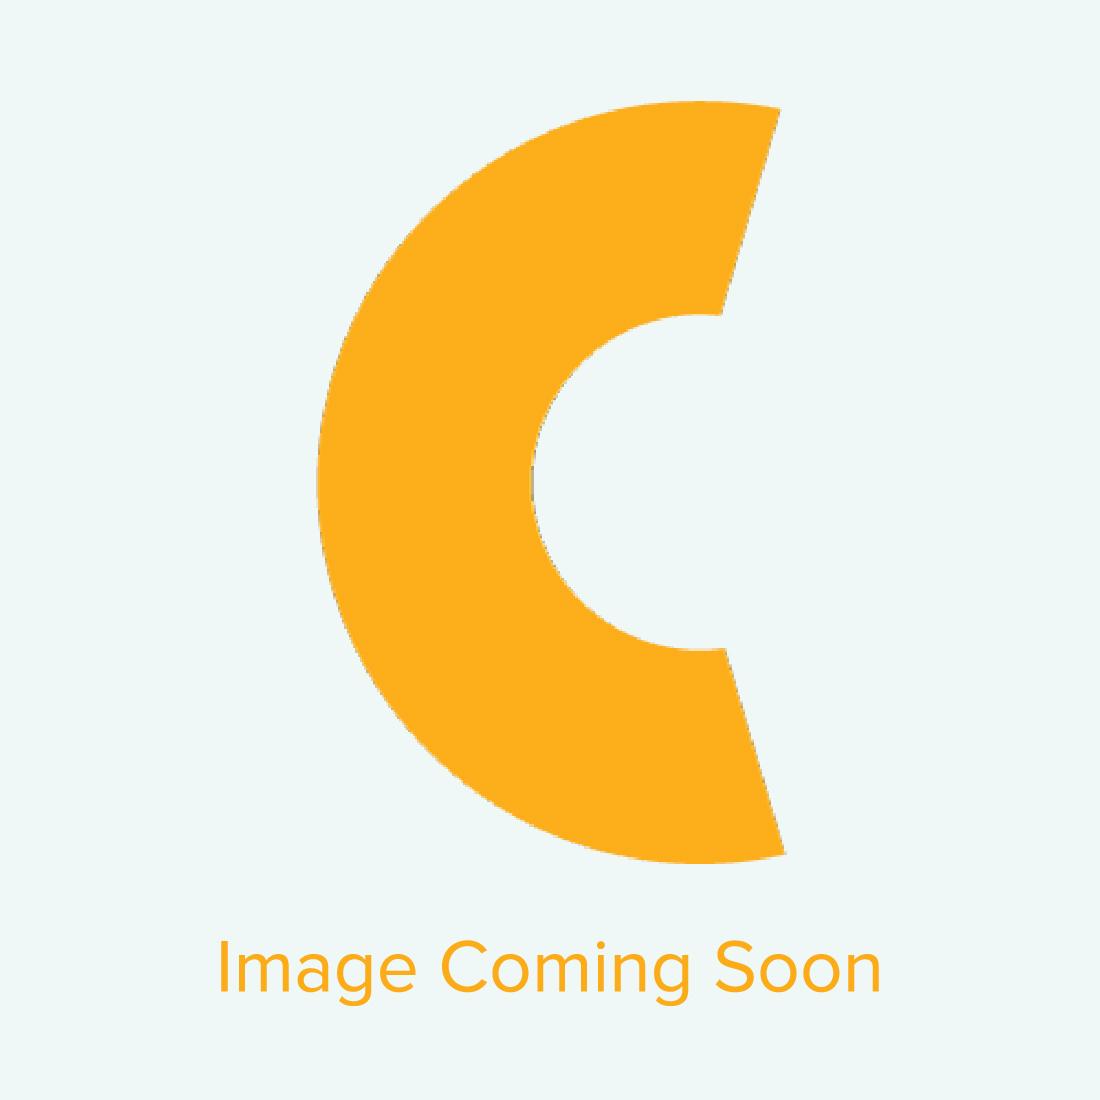 Epson 7700/7890/9700/9890 - Sublijet E Ink - 350 mL - Matte Black (P5) - Expired 12/31/17